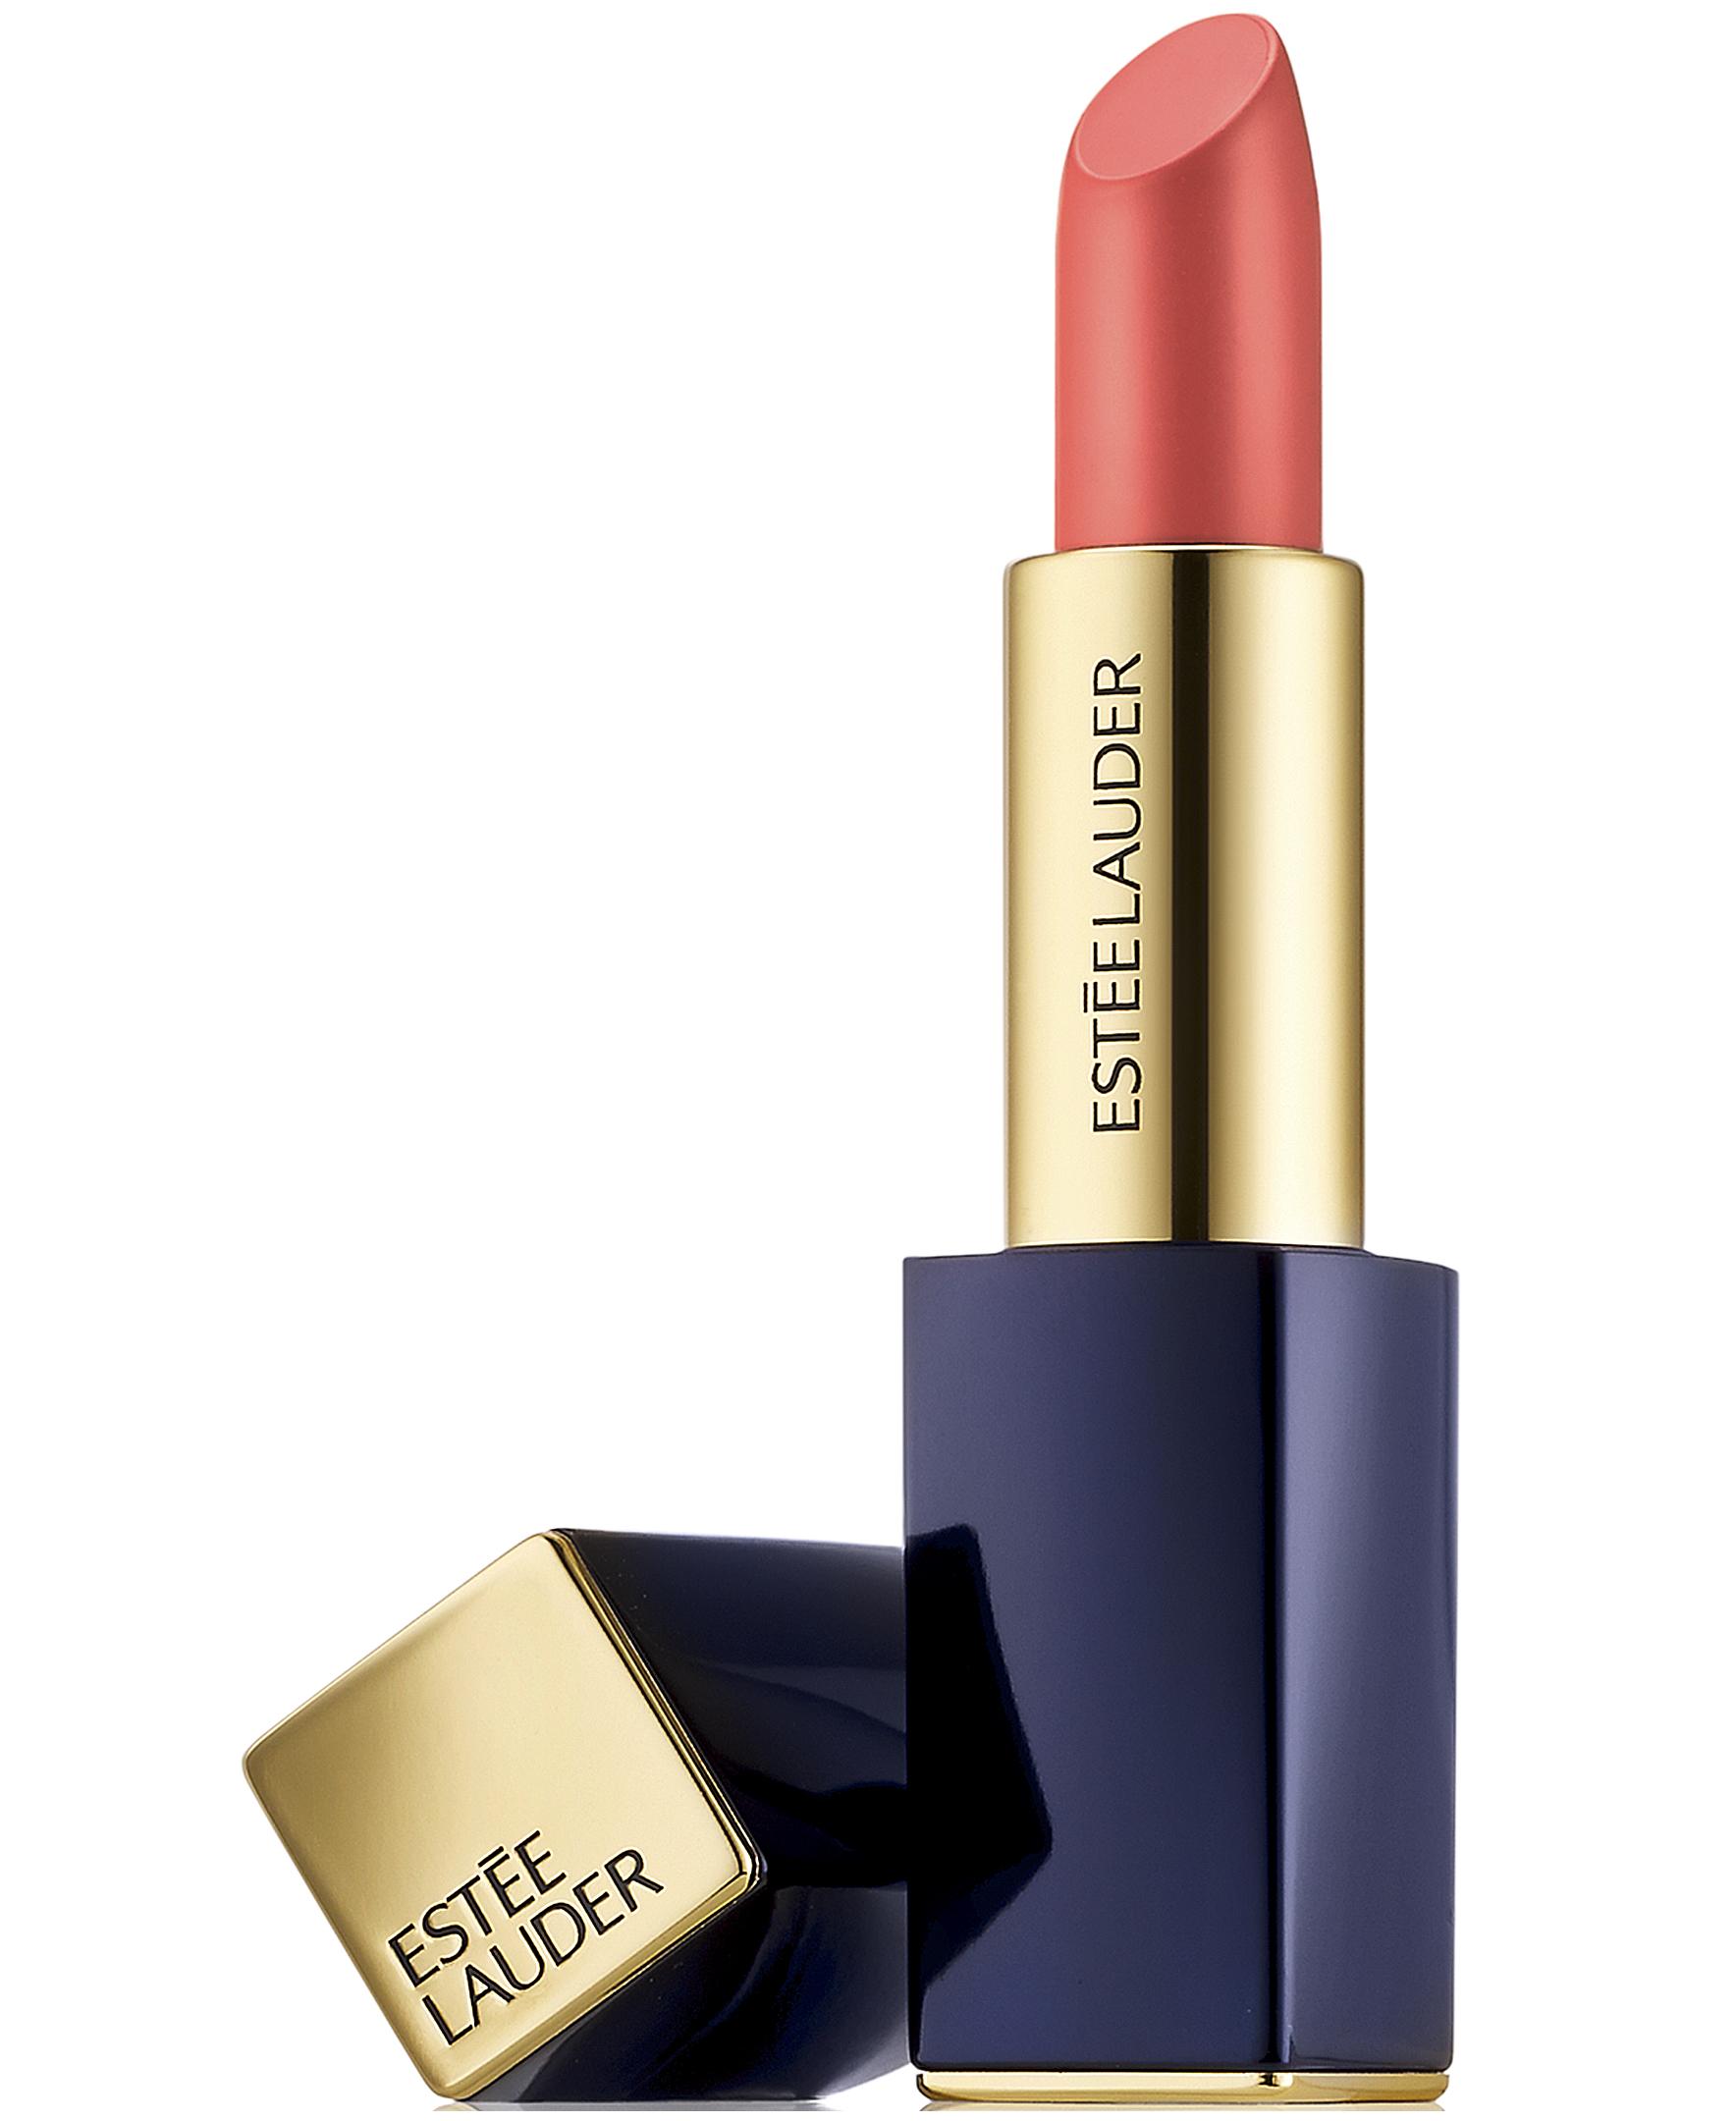 Pure Color Envy Sculpting Lipstick Eccentric